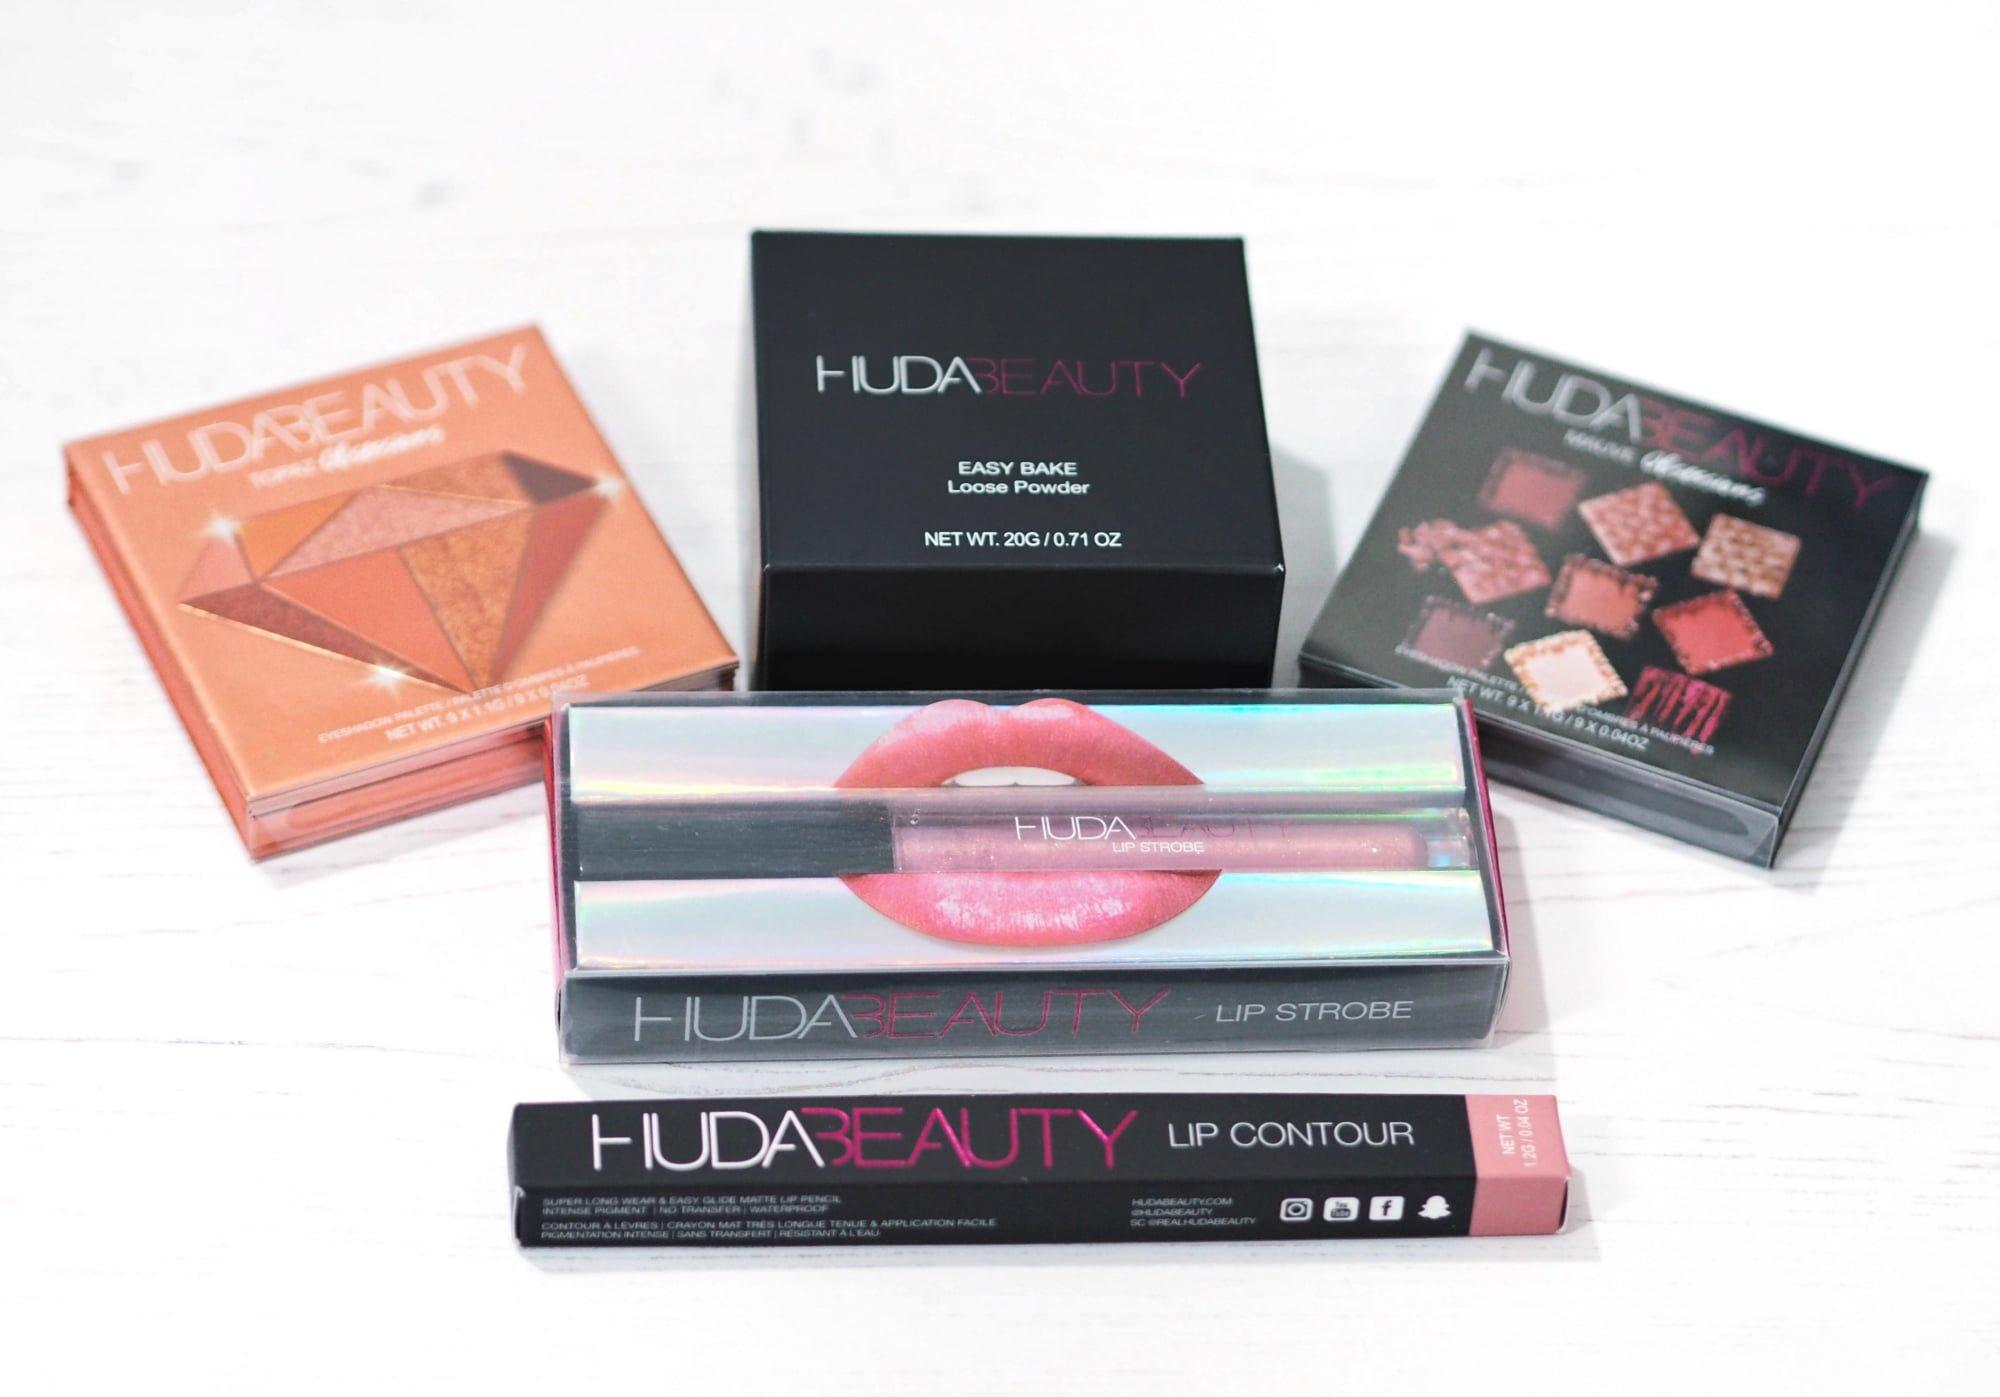 Huda Beauty | Cult Beauty Brand of the Month - November 2018